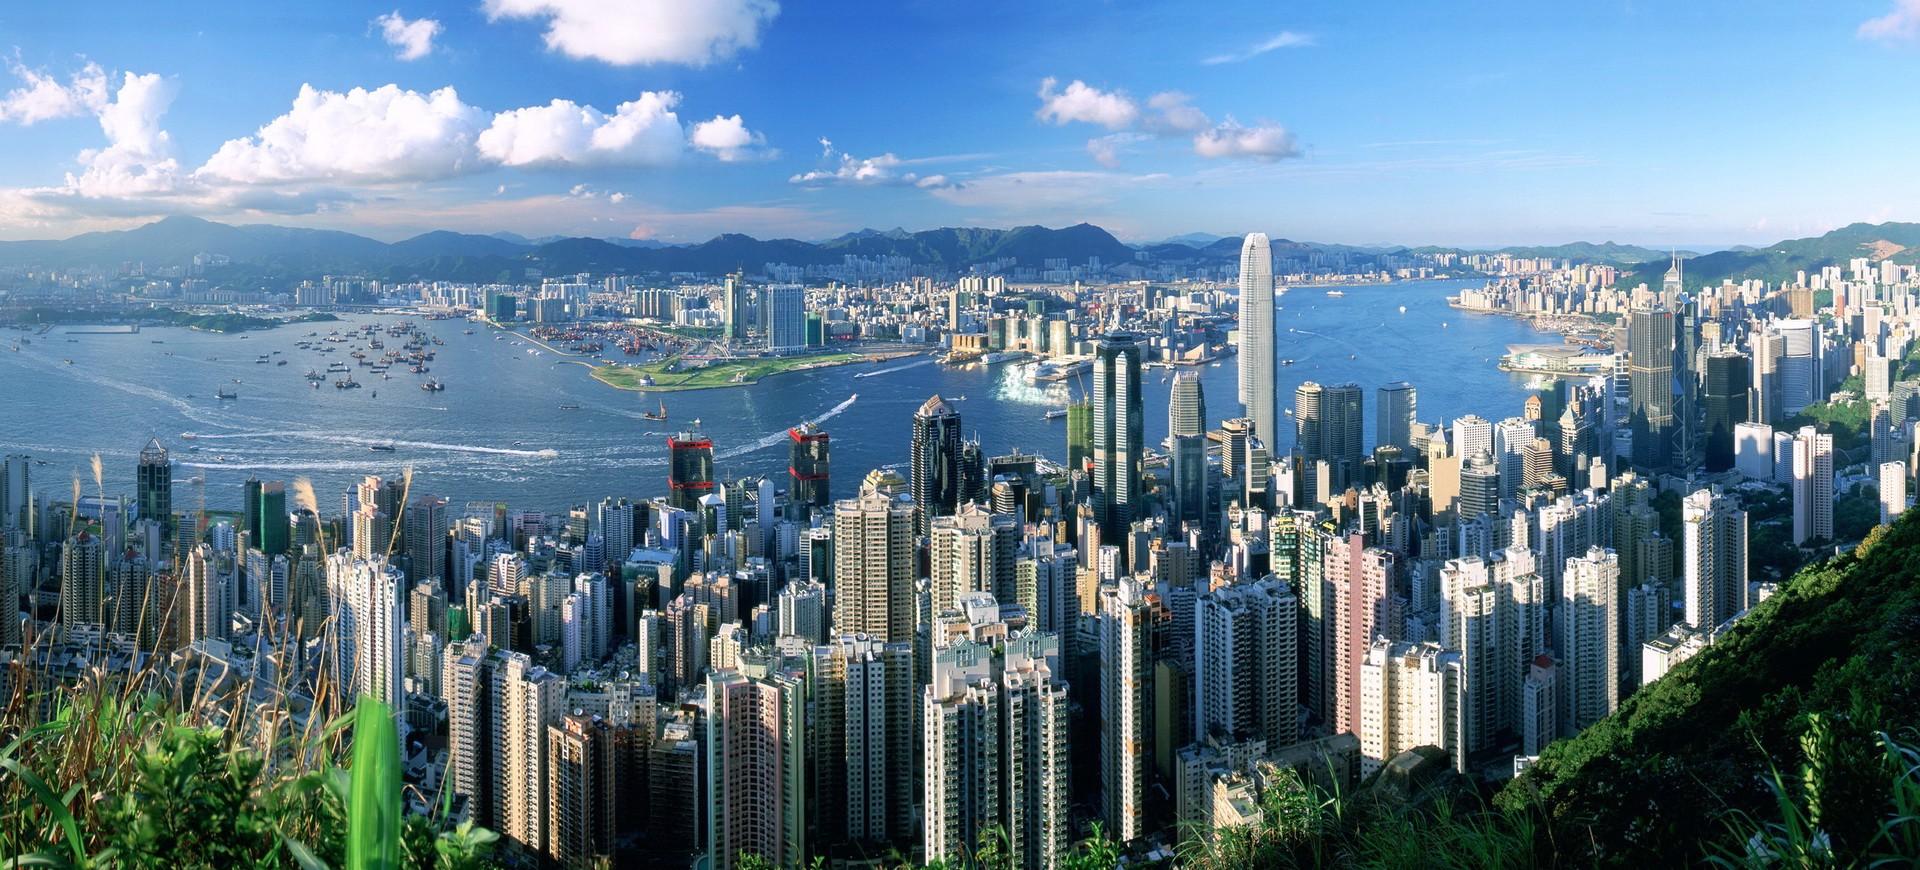 Hong Kong Panorama Vu Panoramique depuis le Pic Victoria